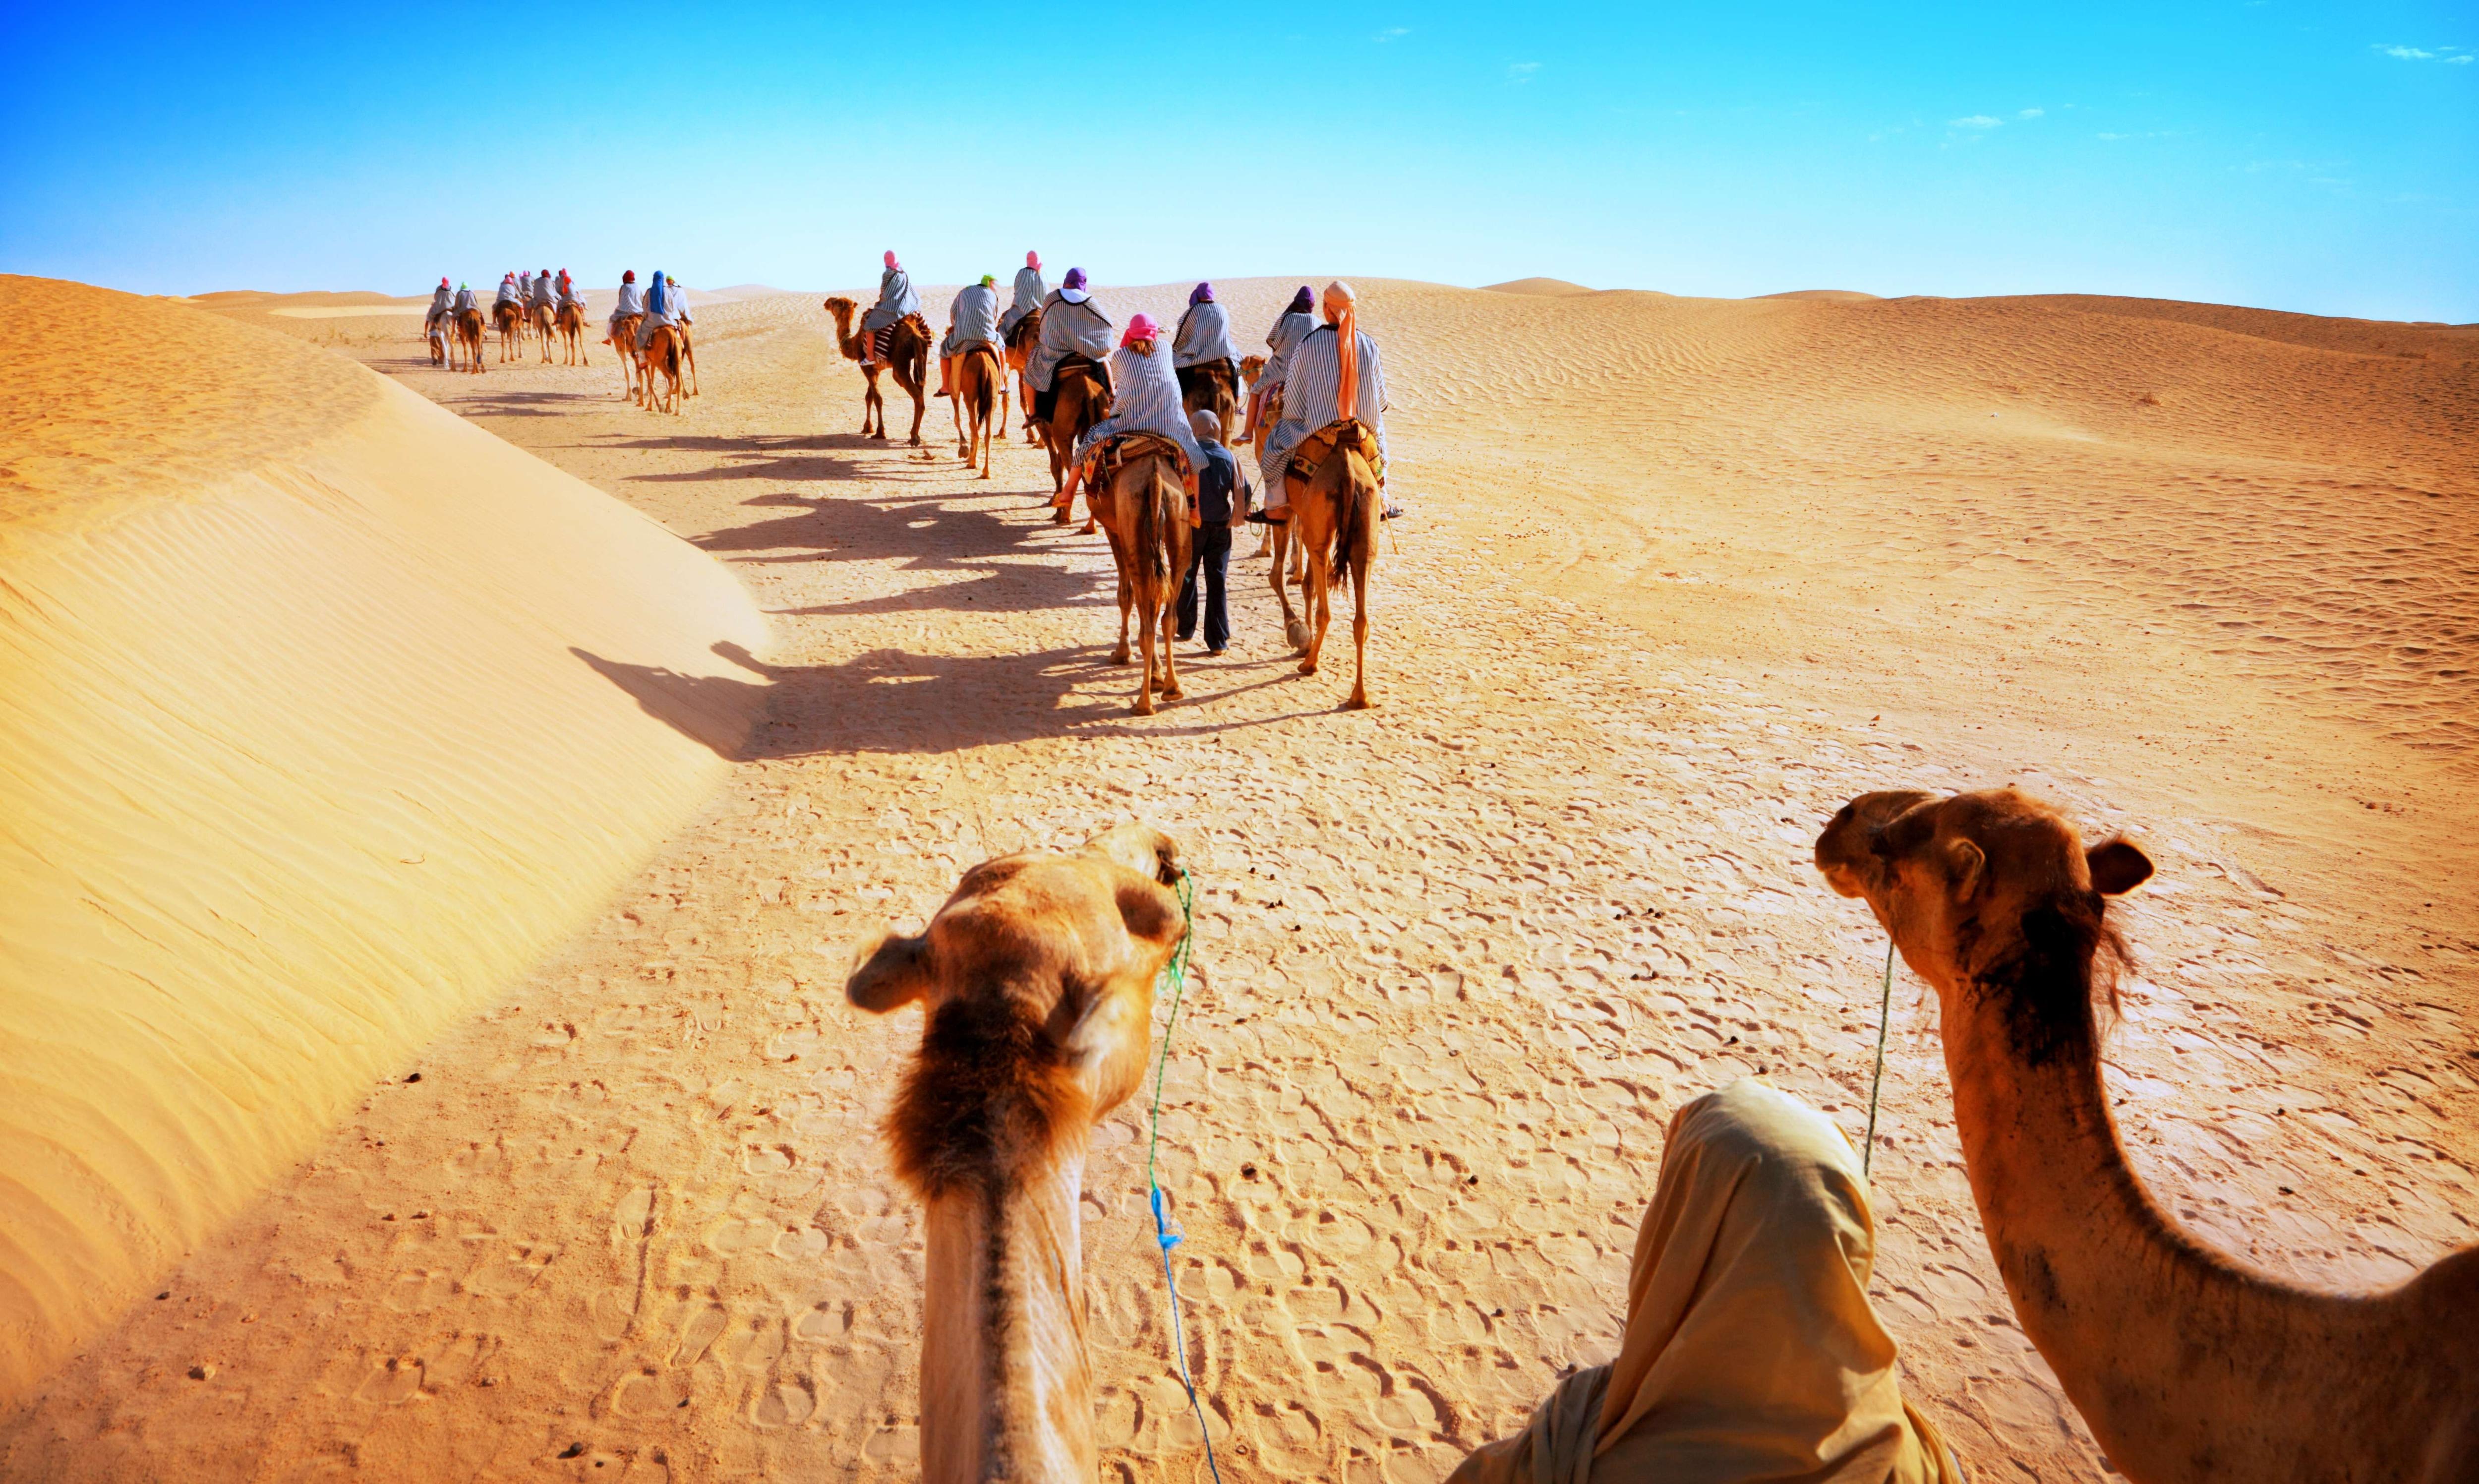 Camel Safari in the Desert - JAISALMER, INDIA ... - YouTube